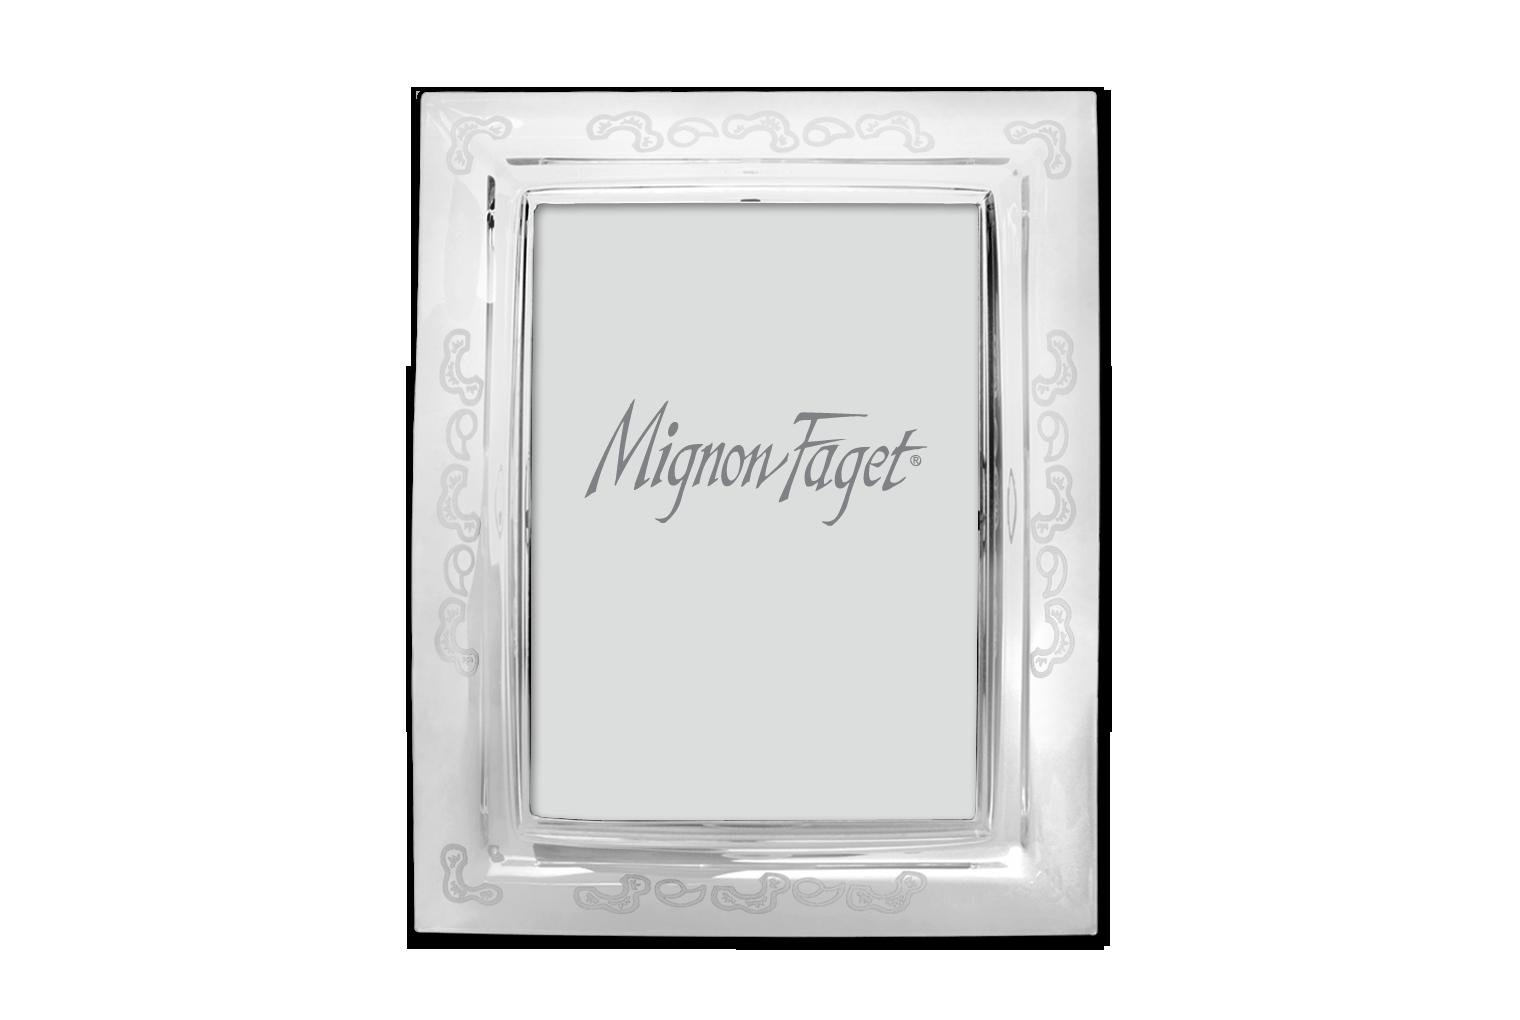 Fleur de Lis Crystal Frame: Mignon Faget | Mf. Home | Pinterest